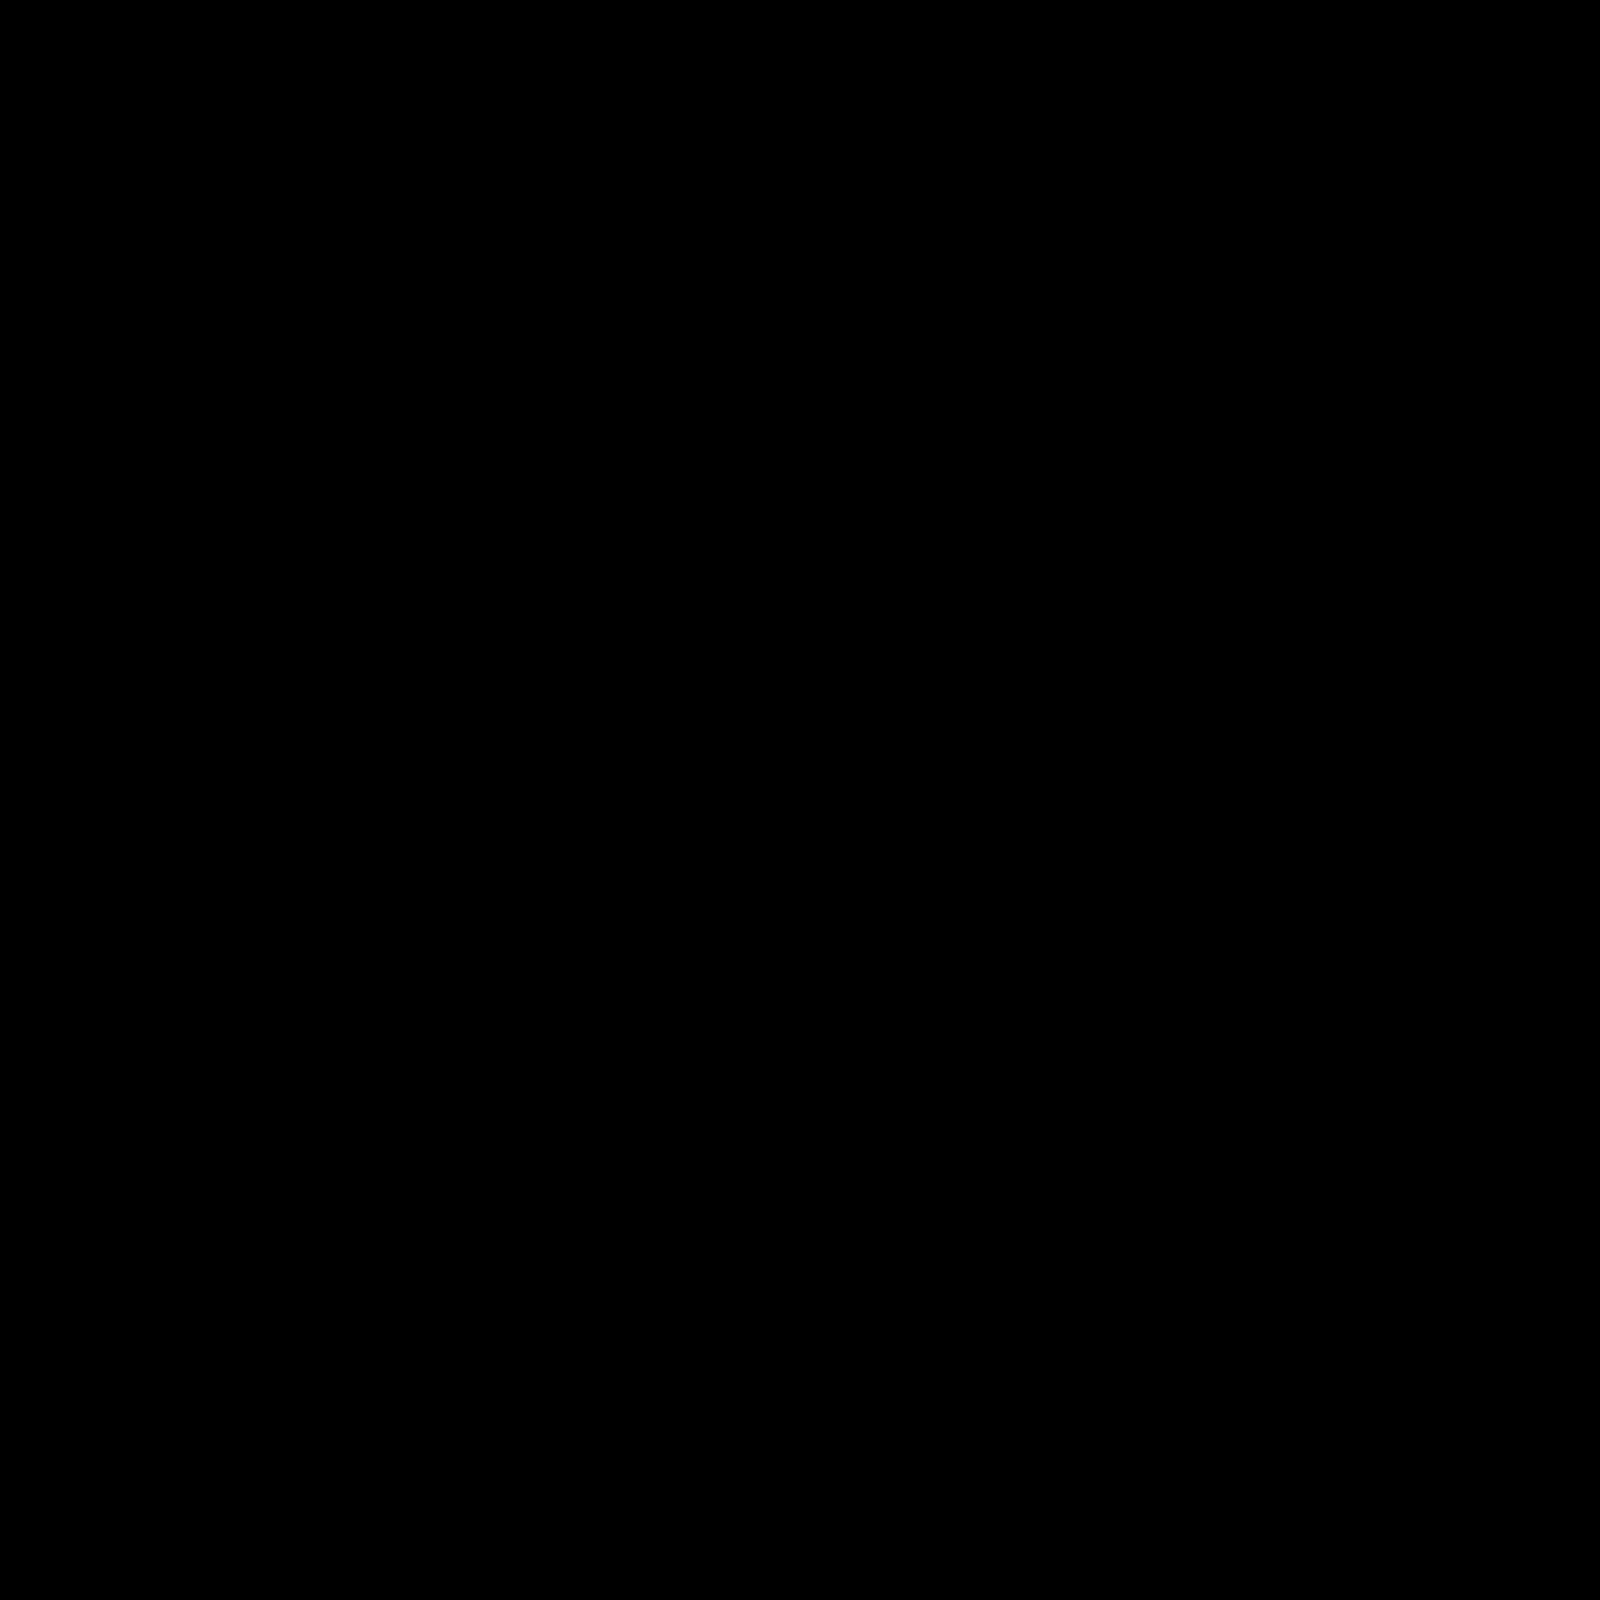 Gmail logo PNG images free download.